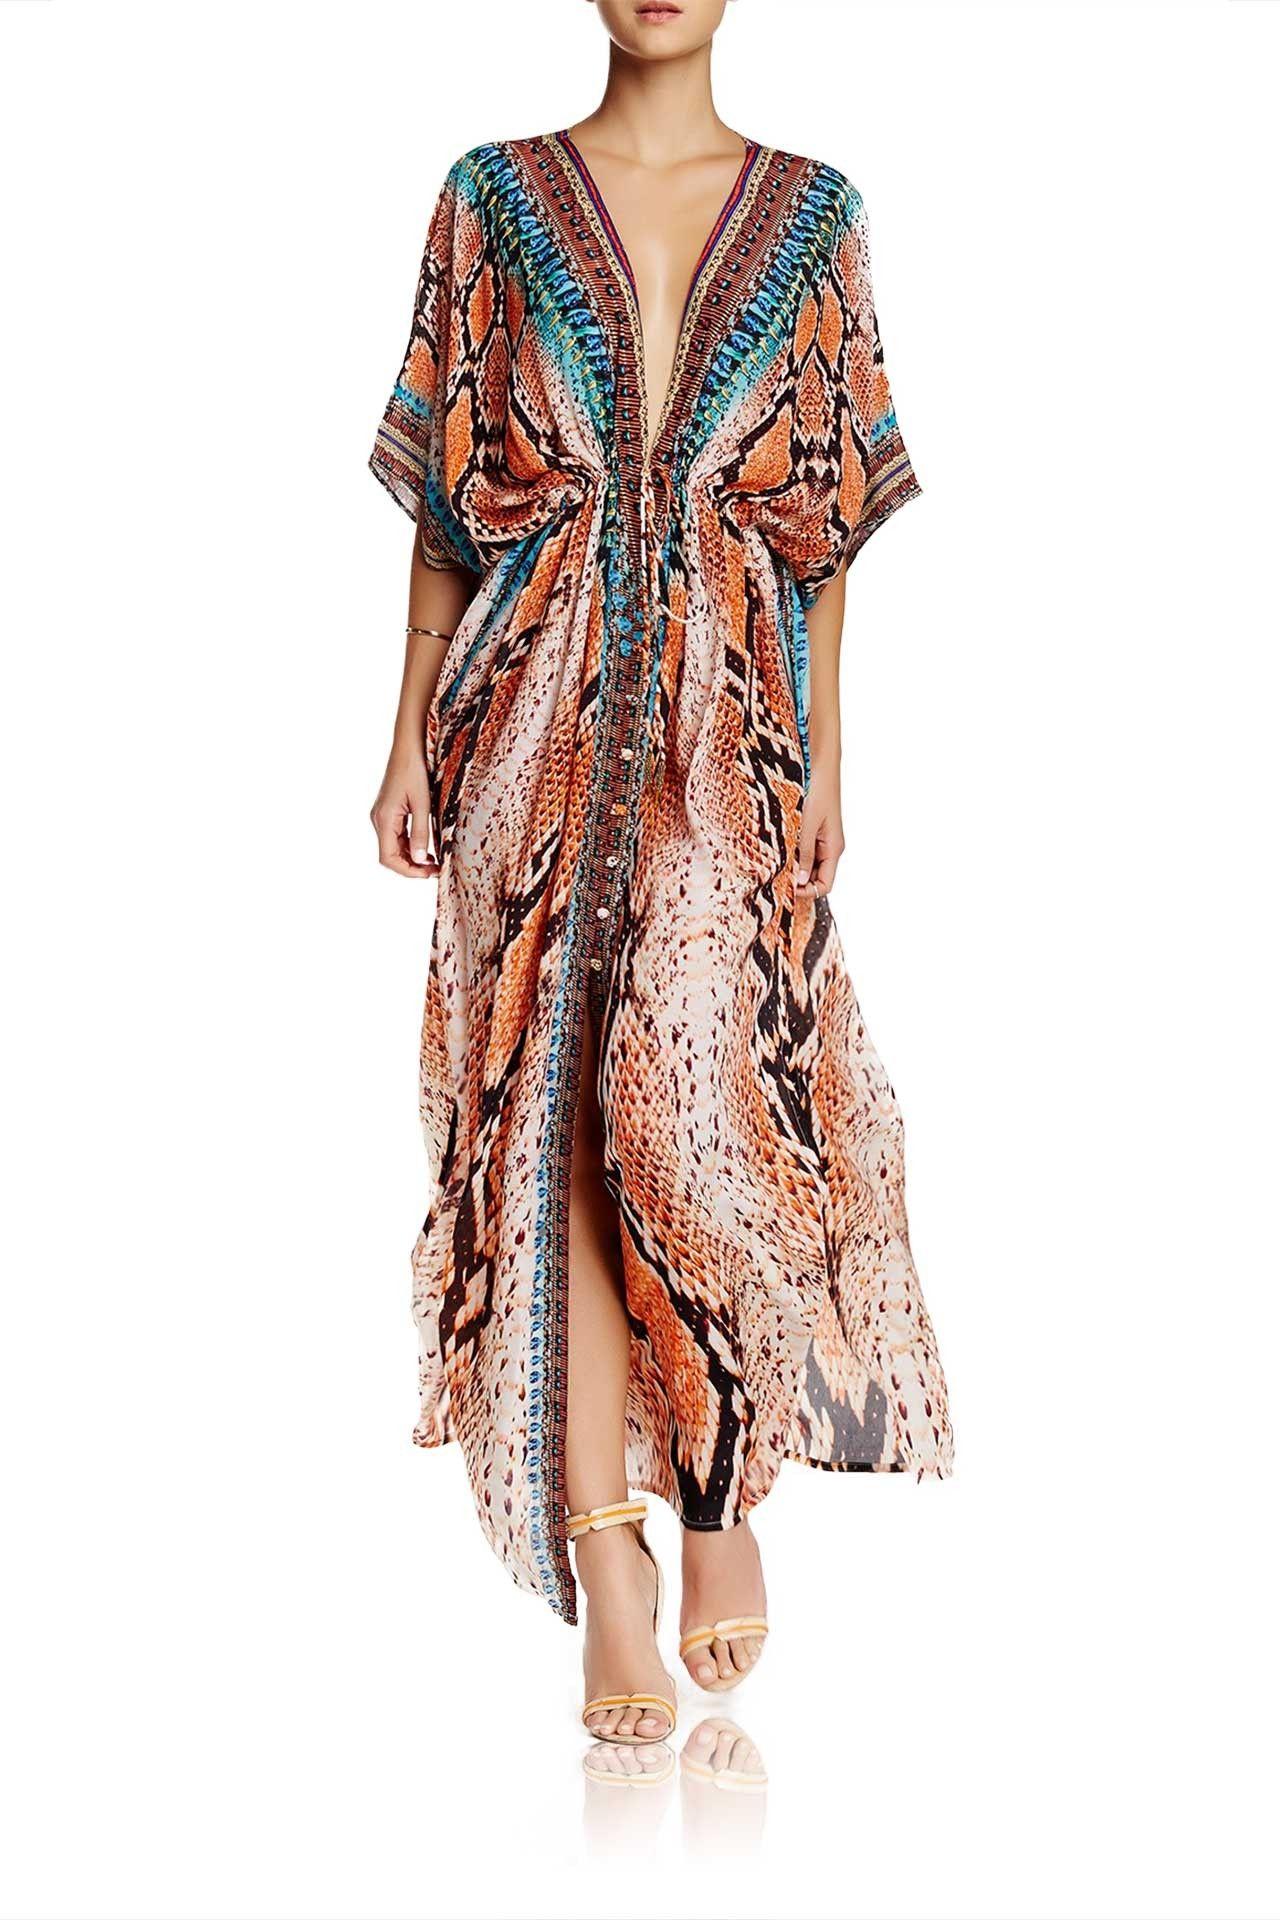 0cedcd6a30d Brown Snakeskin Kaftan Cover Up - Designer Women's Clothing ...